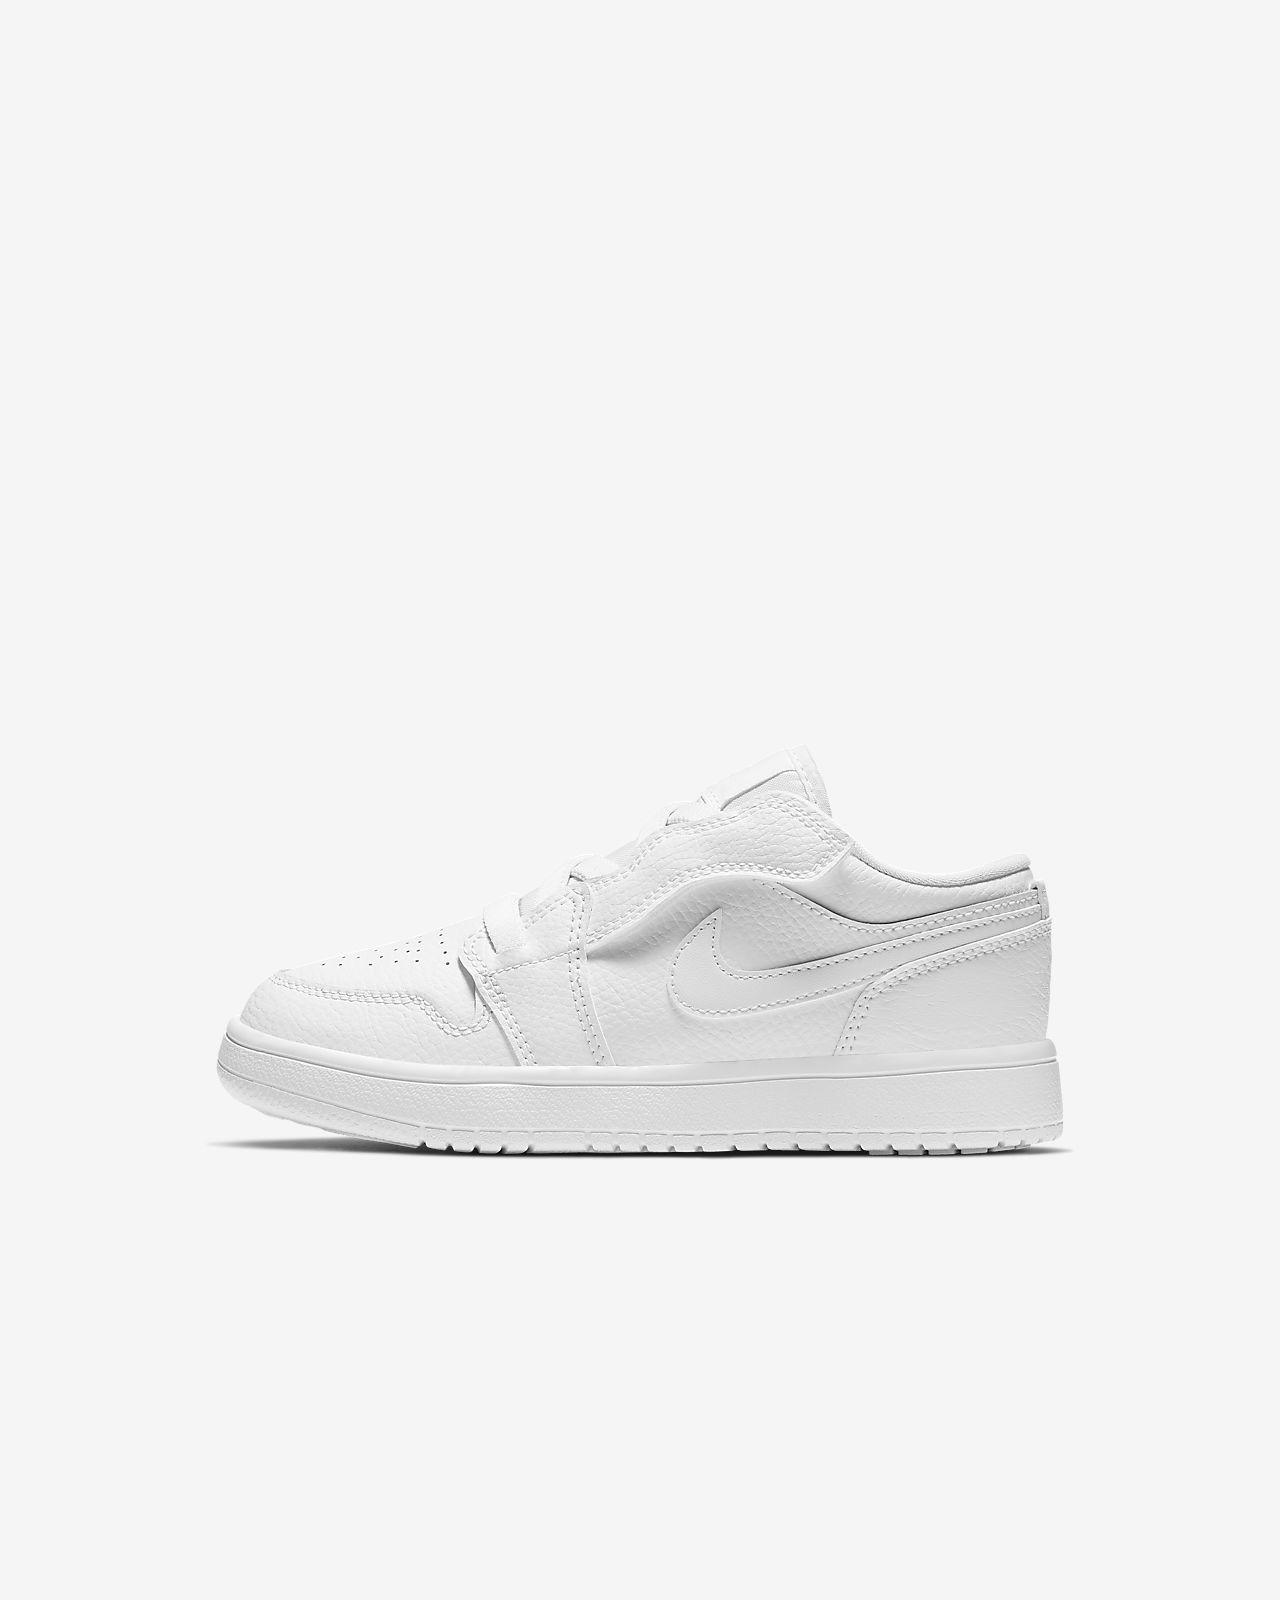 Jordan 1 Low Alt (PS) 幼童运动童鞋